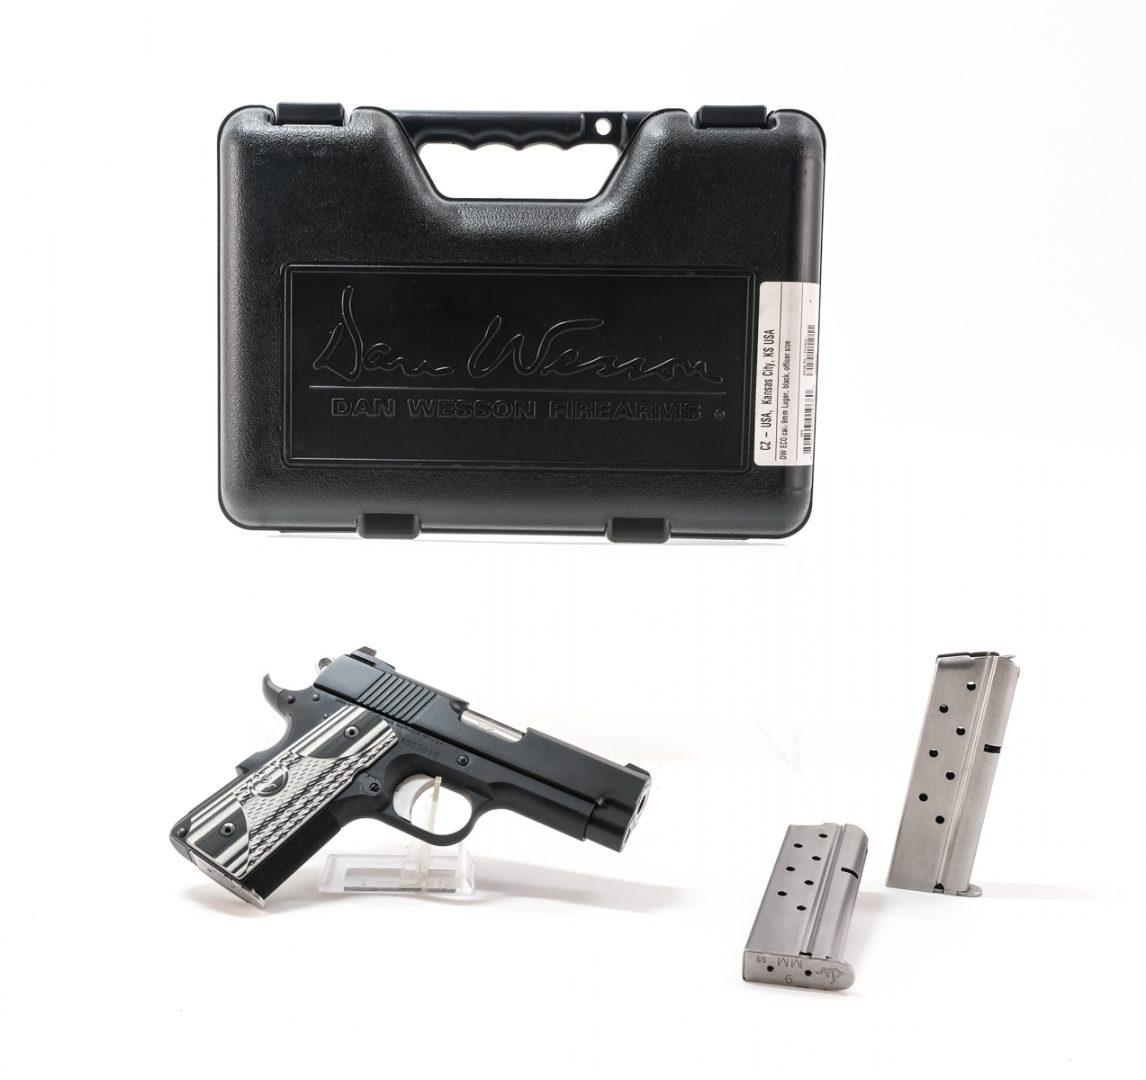 Dan Wesson Eco 9mm Pistol